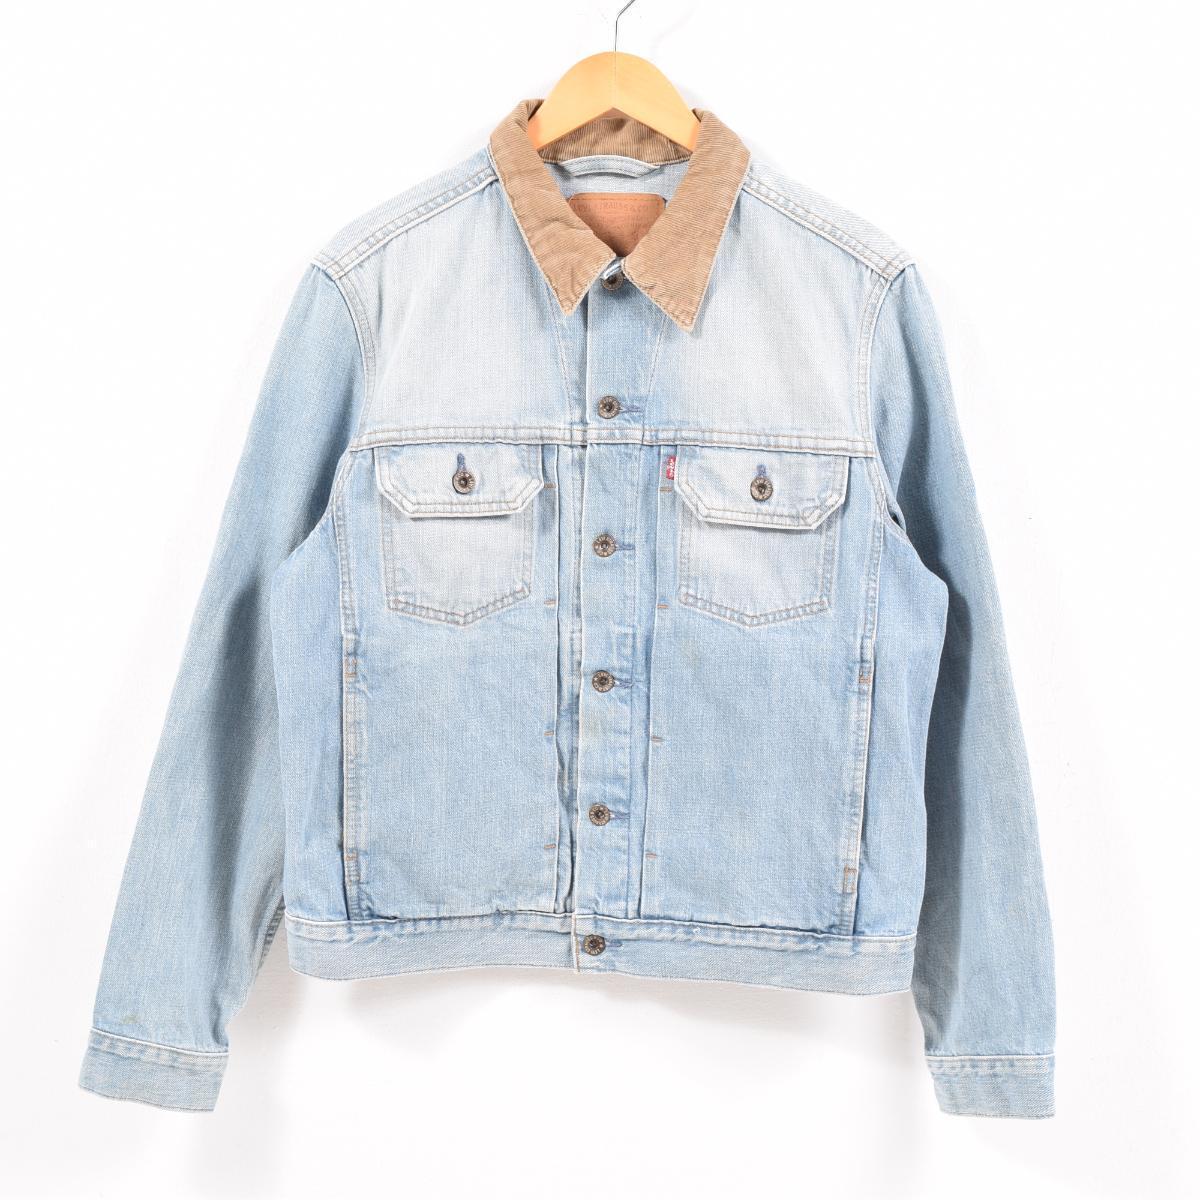 Levis Levis 70527 0360 Corduroy Collar 2nd Type Denim Jacket G Jean Men M Waw5596